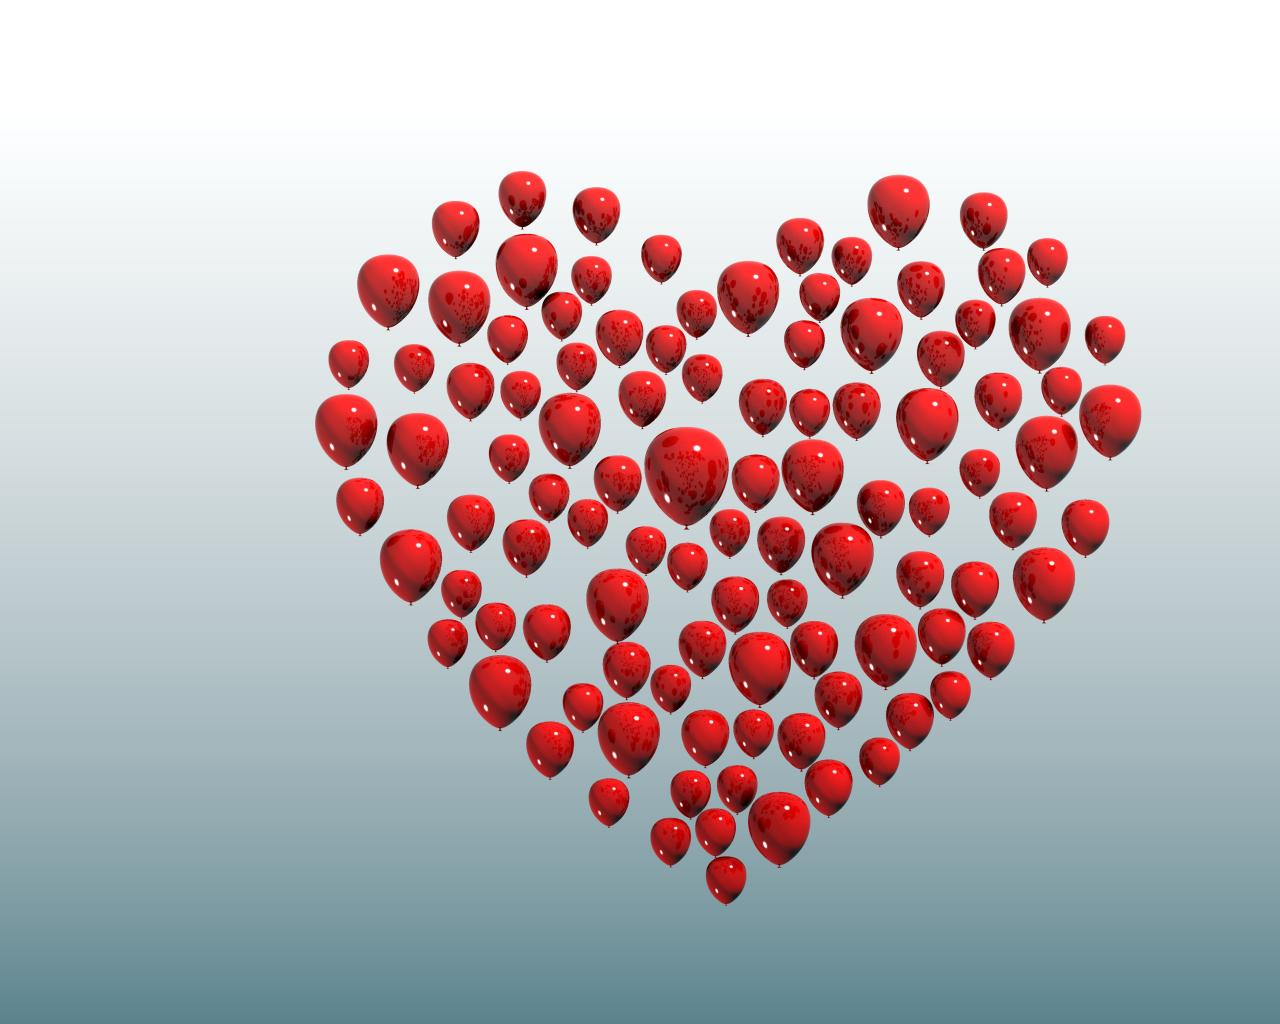 heart_balloons.jpg